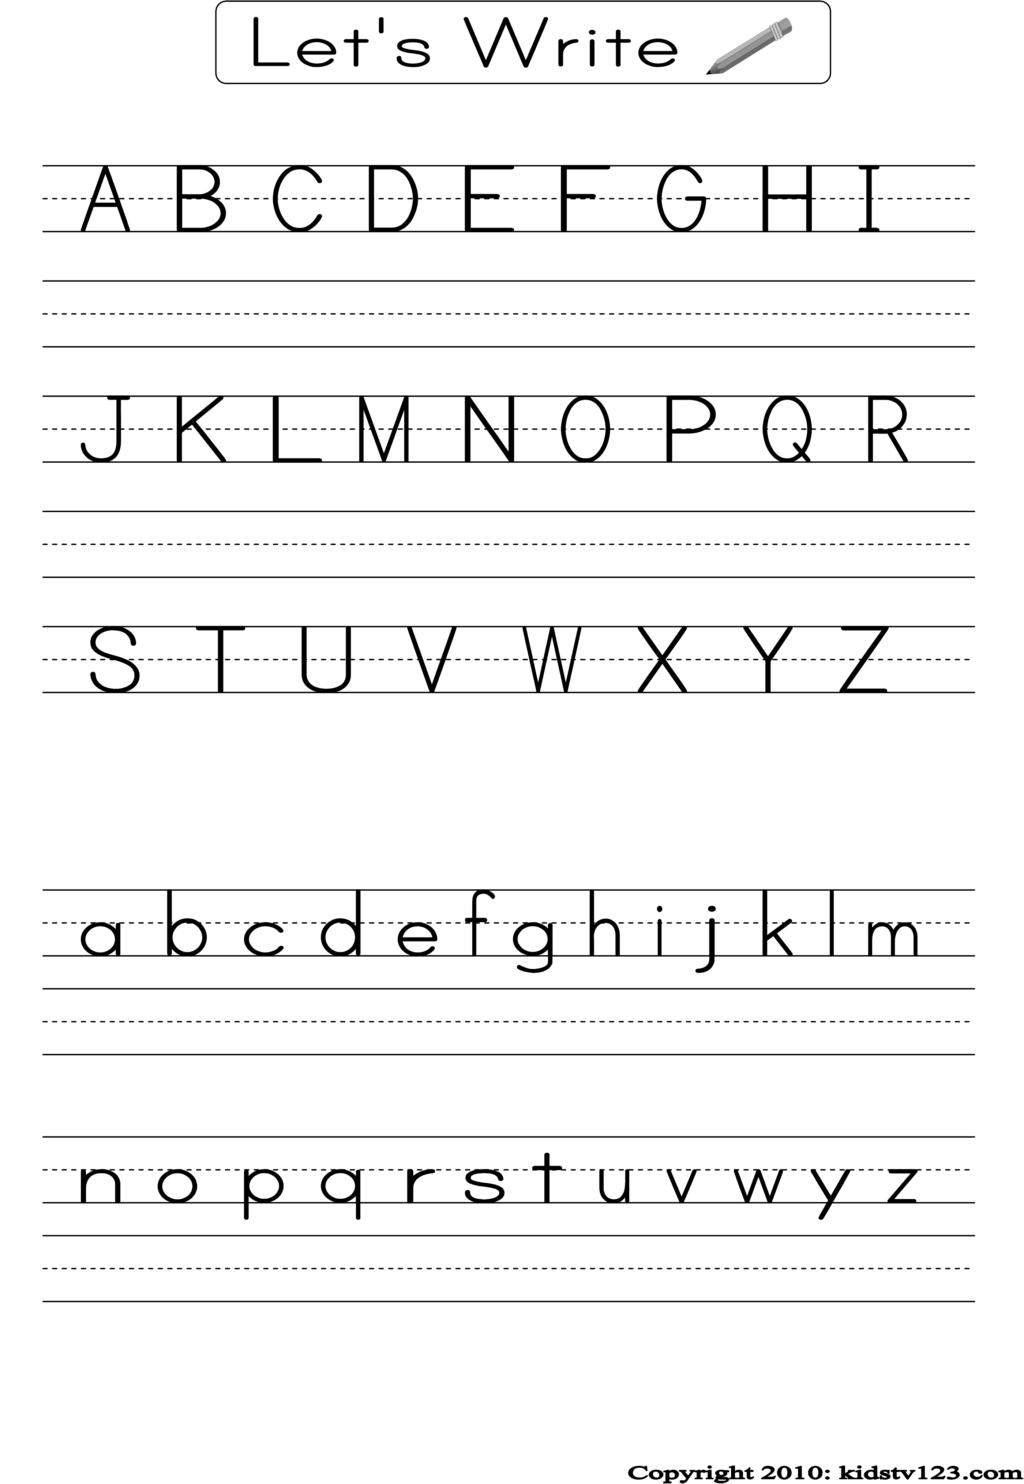 Worksheet ~ Worksheet Alphabet Writing Practice Sheet within Alphabet Writing Worksheets For 1St Grade